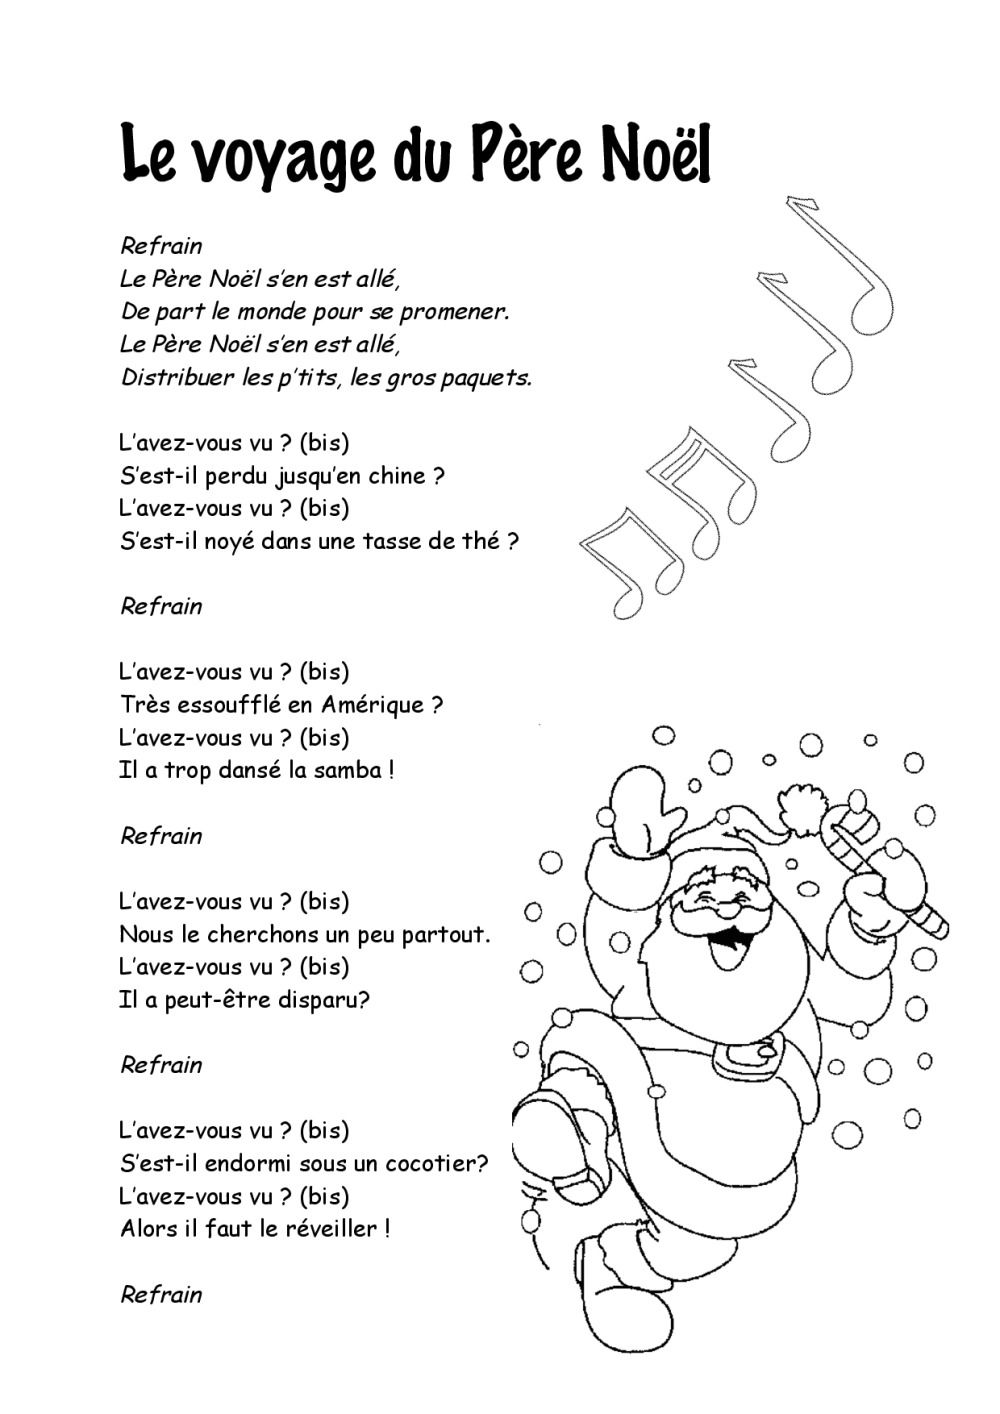 Paroles Chants De Noel Paroles chansons de Noël | BDRP